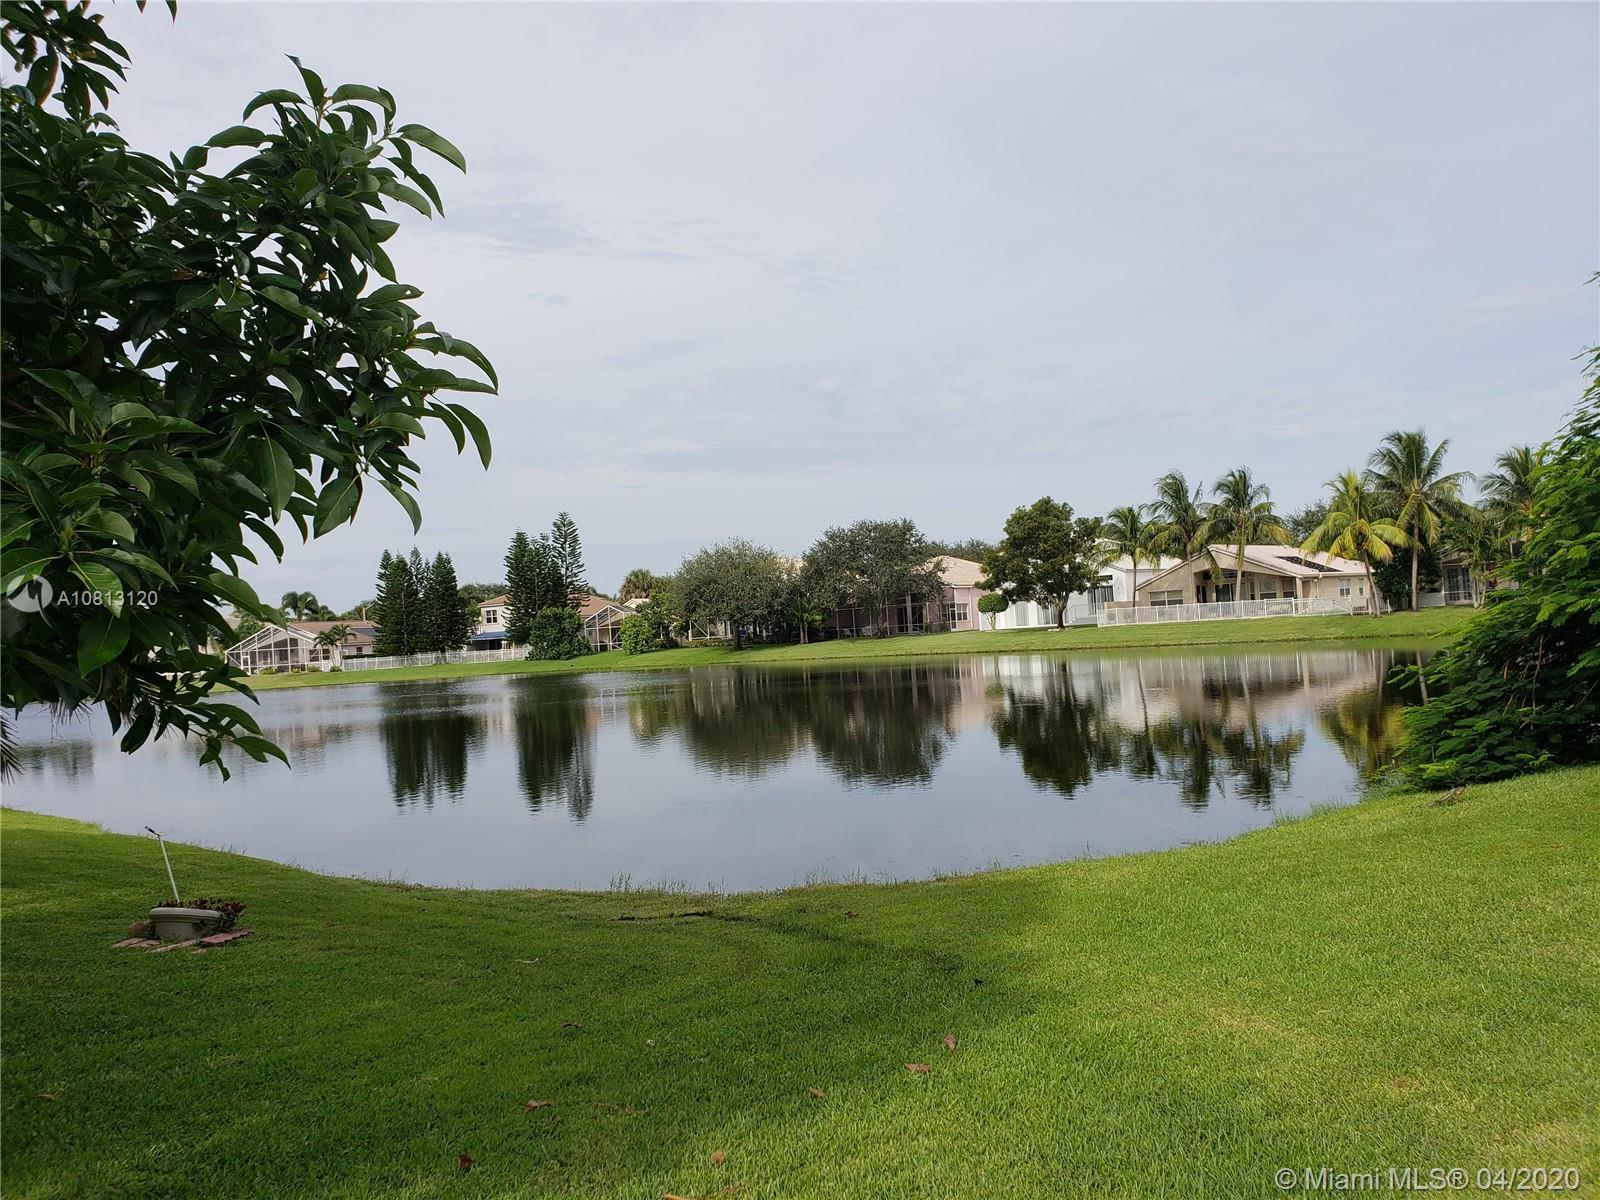 6802 Columbia Ave, Lake Worth, FL 33467